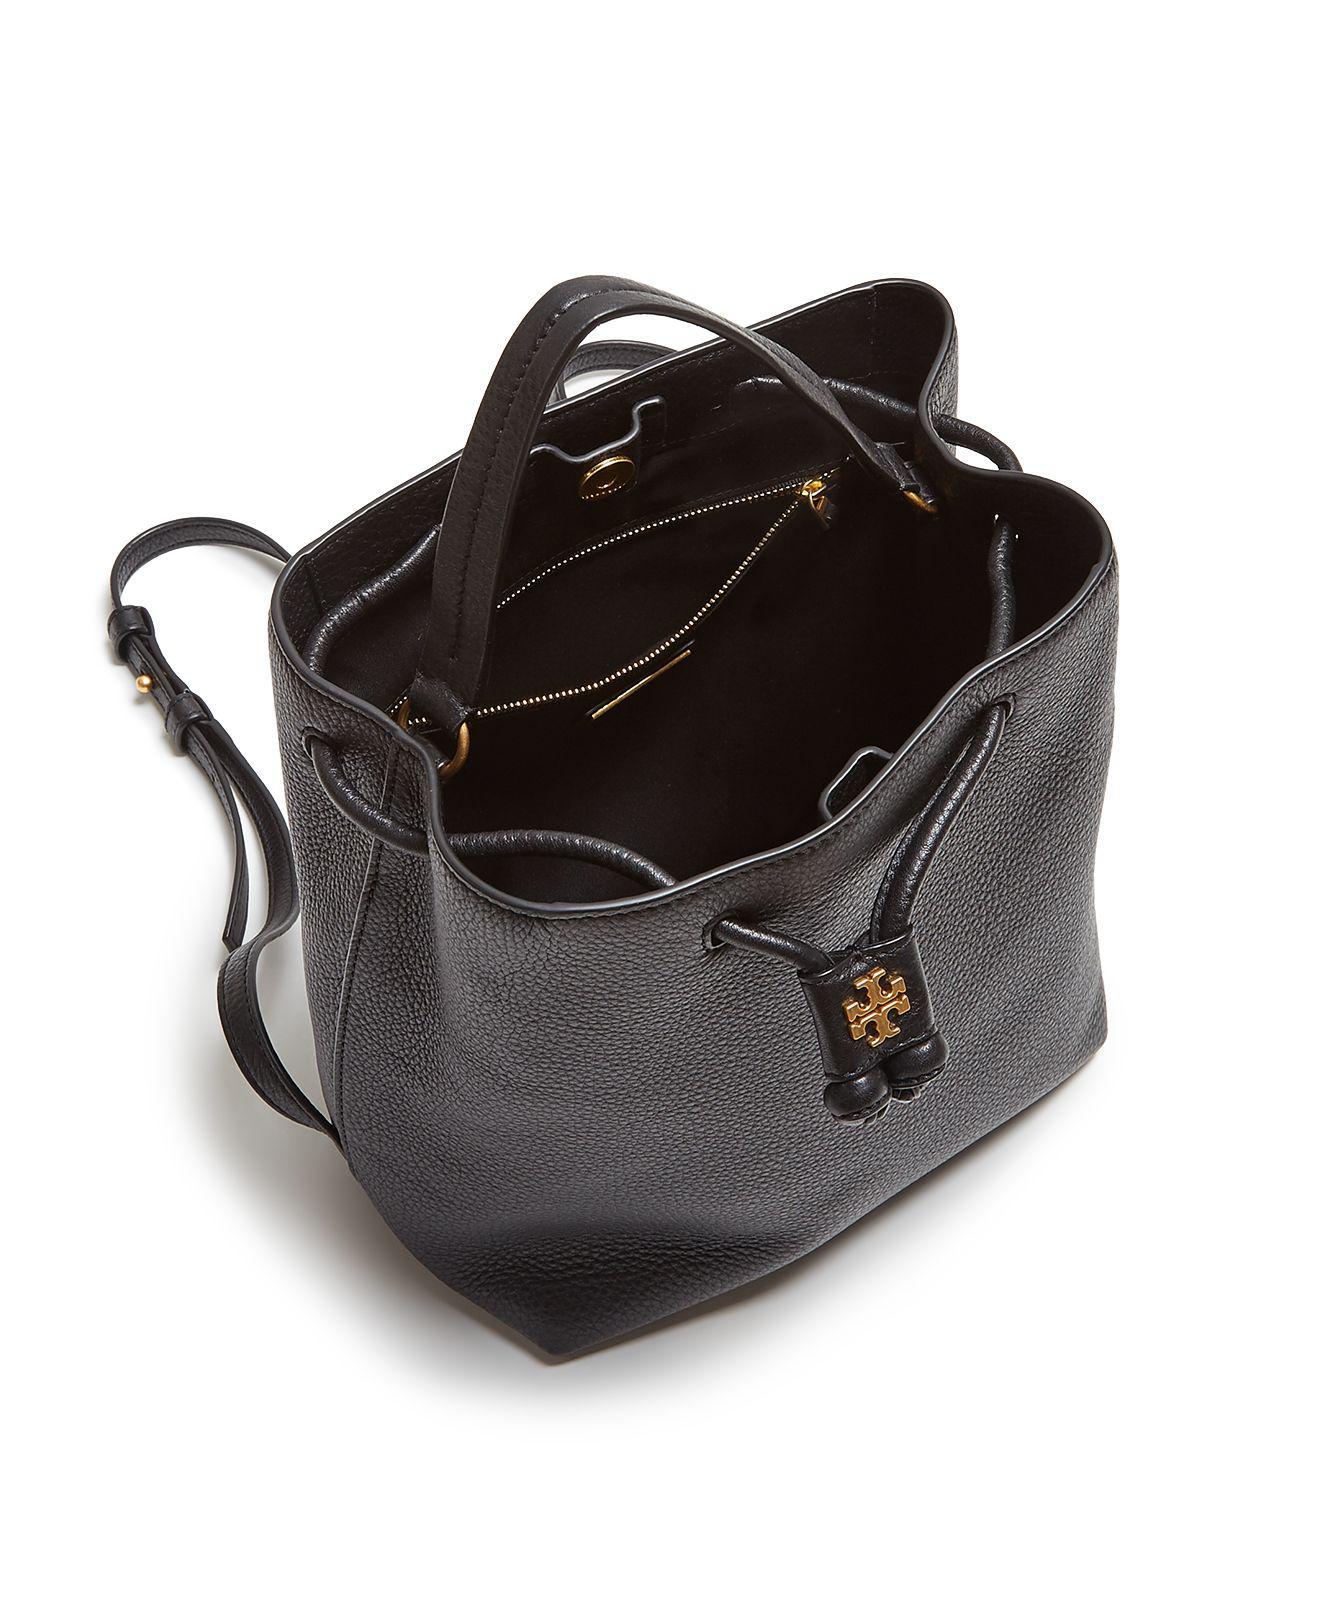 54ac7887f65 Lyst - Tory Burch Georgia Pebbled Leather Backpack in Black